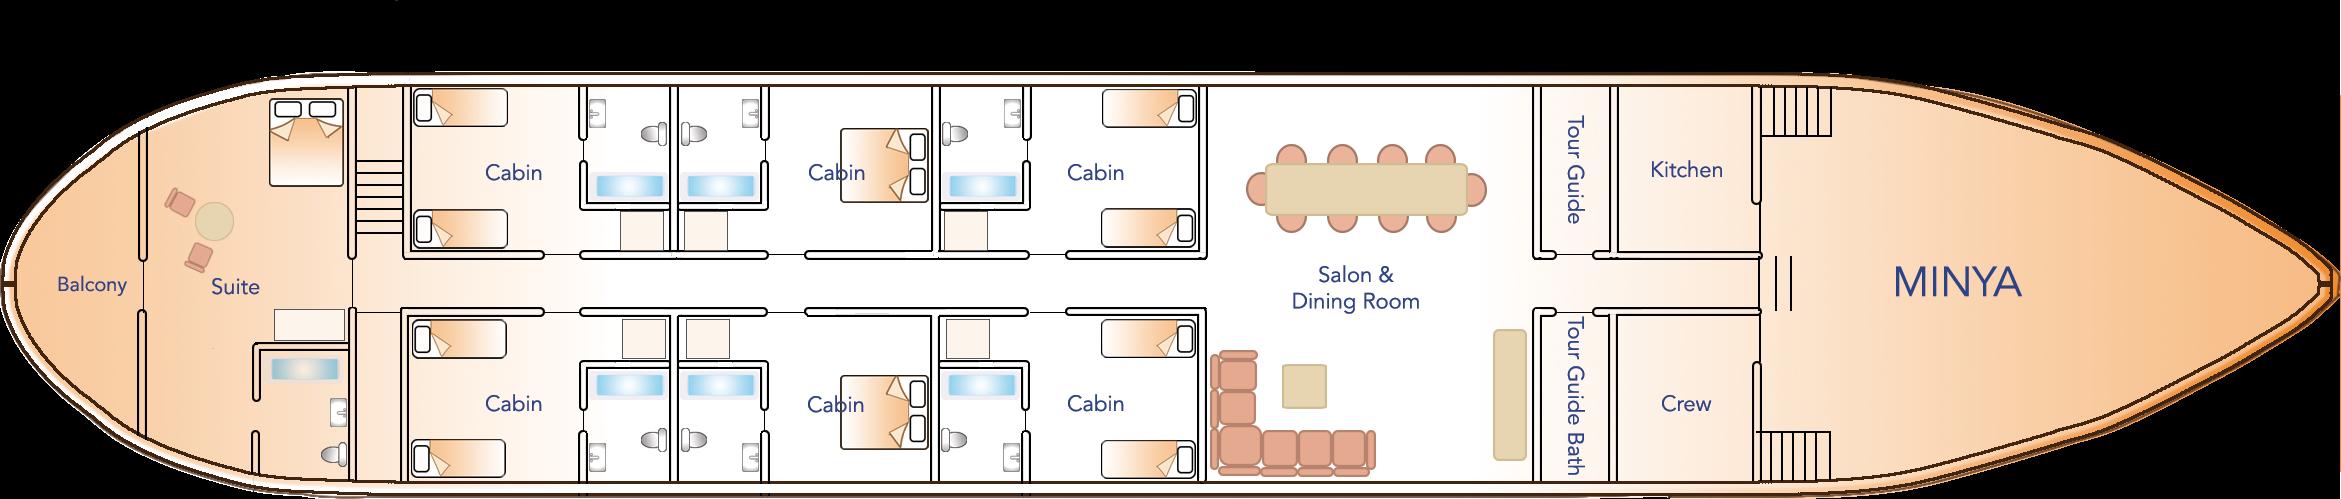 Floorplan MINYA